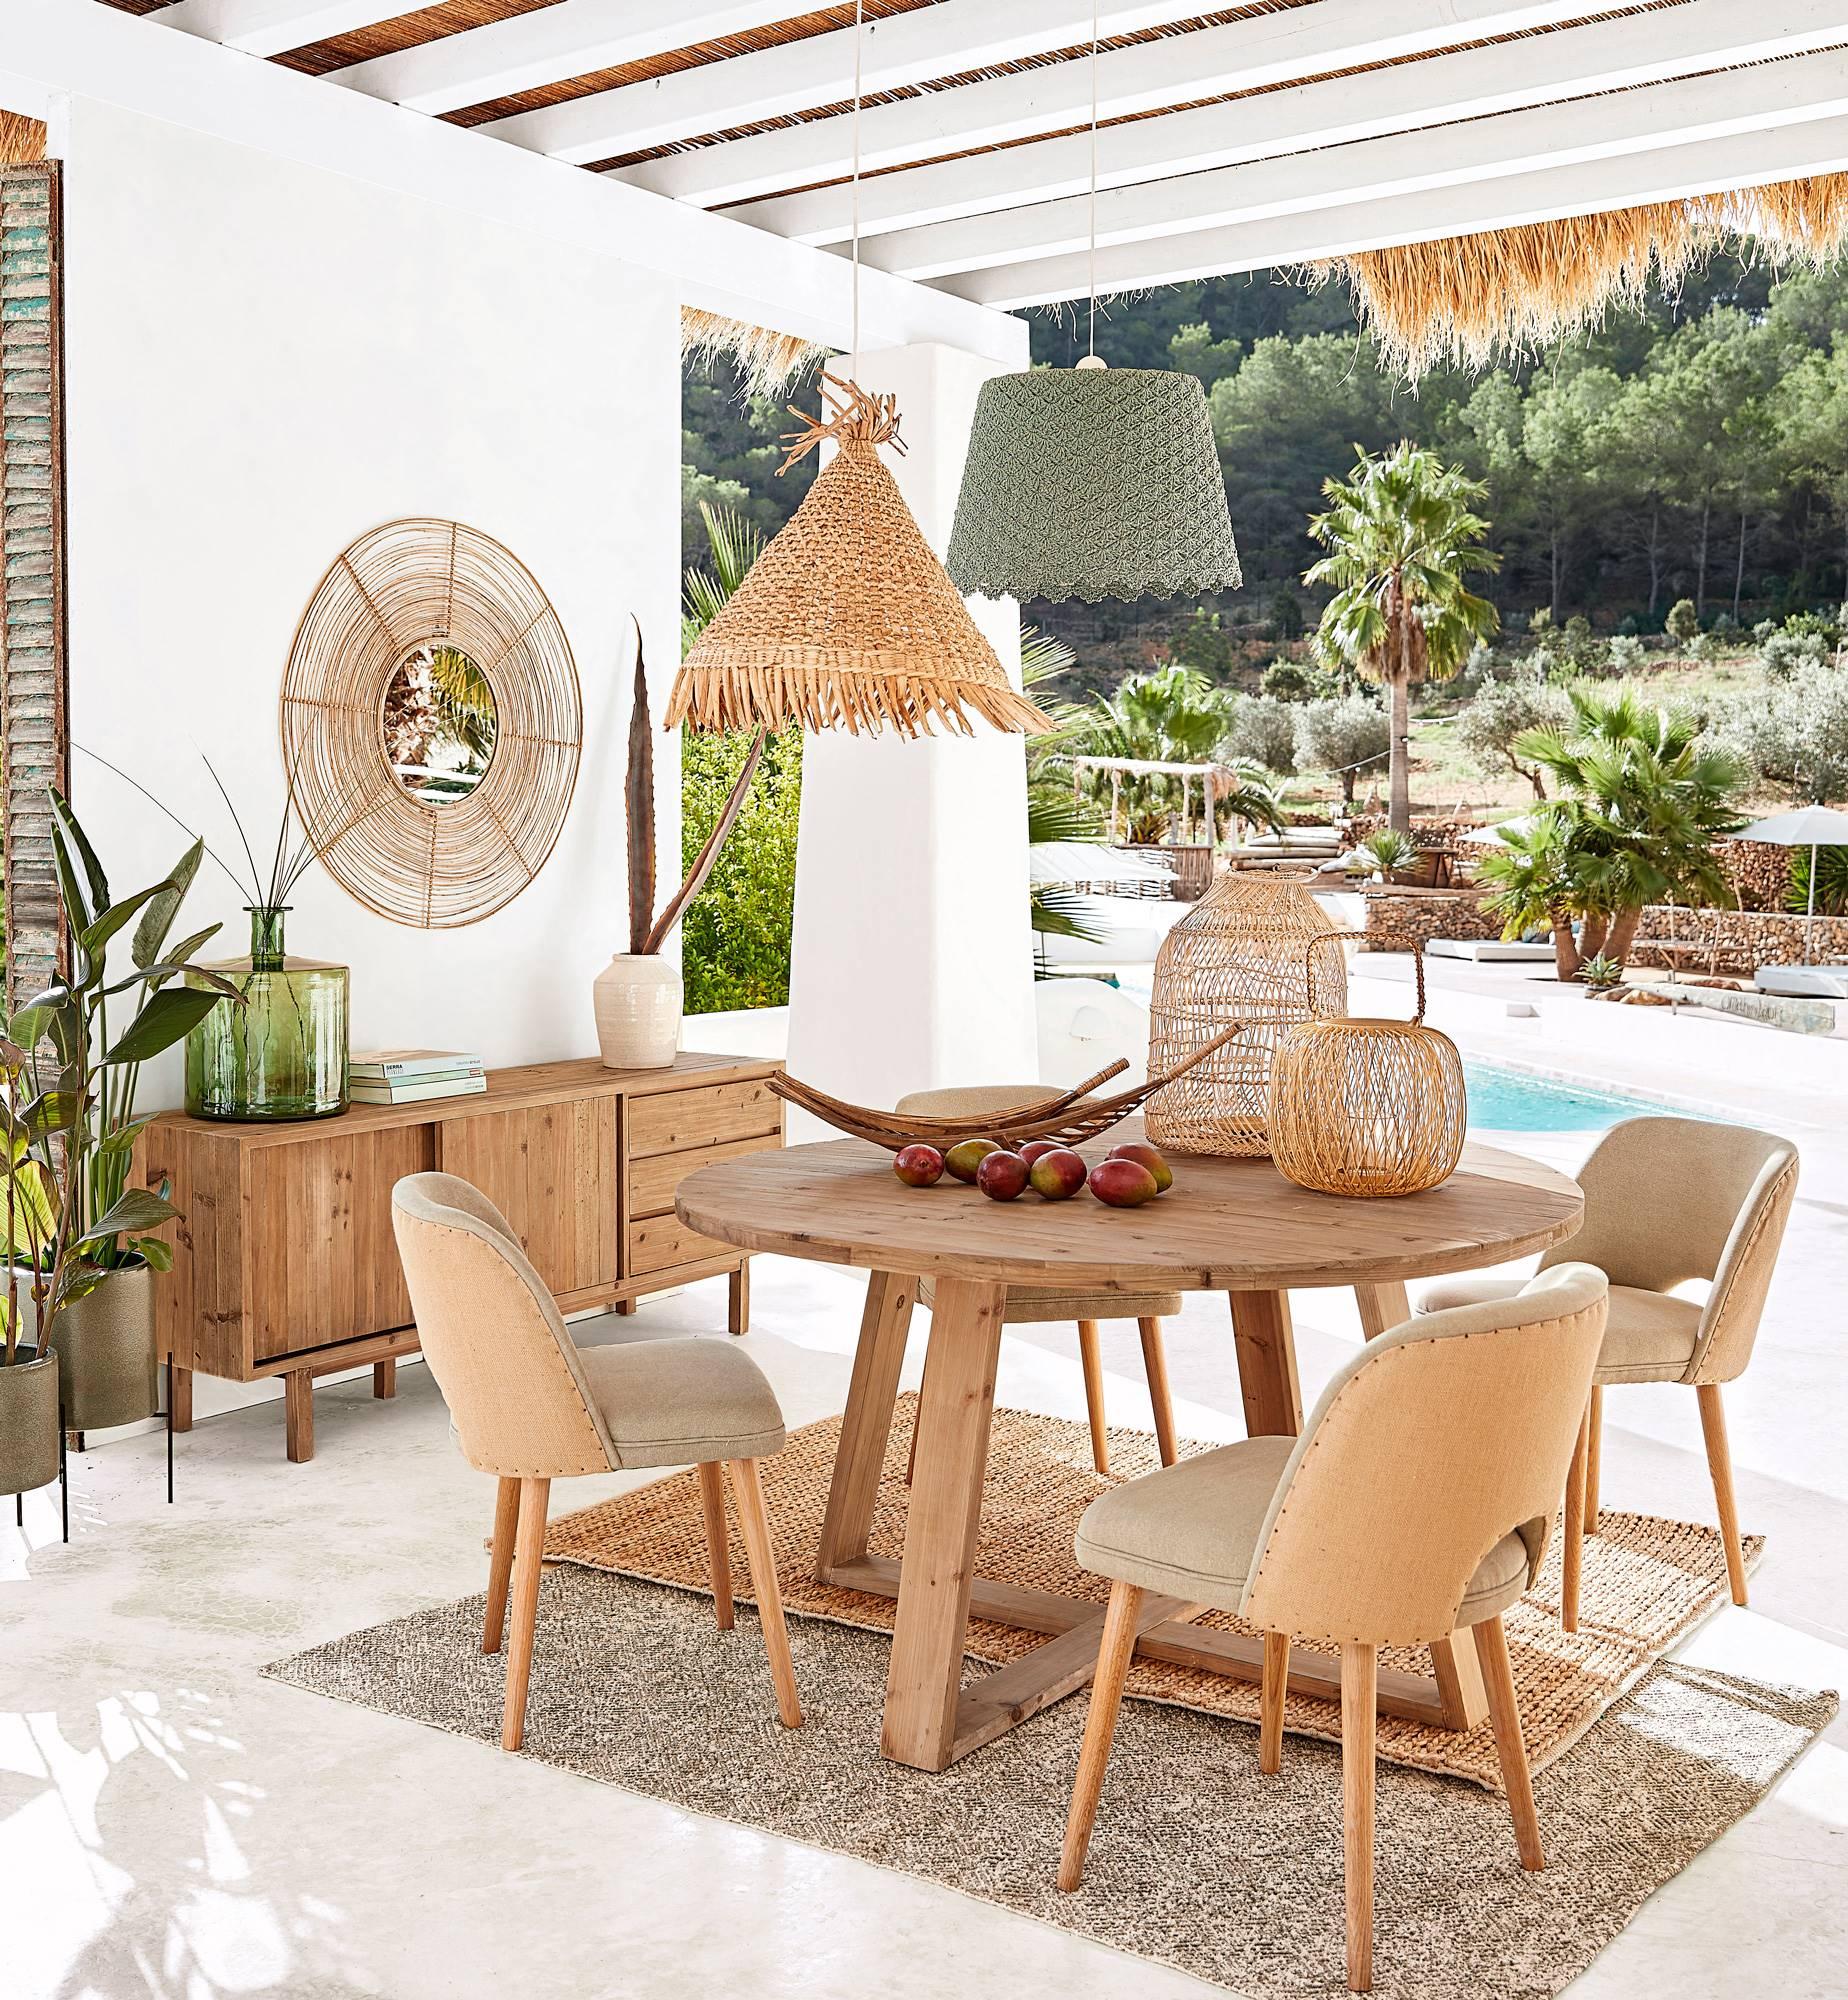 Maison Du Monde München : muebles para la primavera verano de maisons du monde ~ Watch28wear.com Haus und Dekorationen